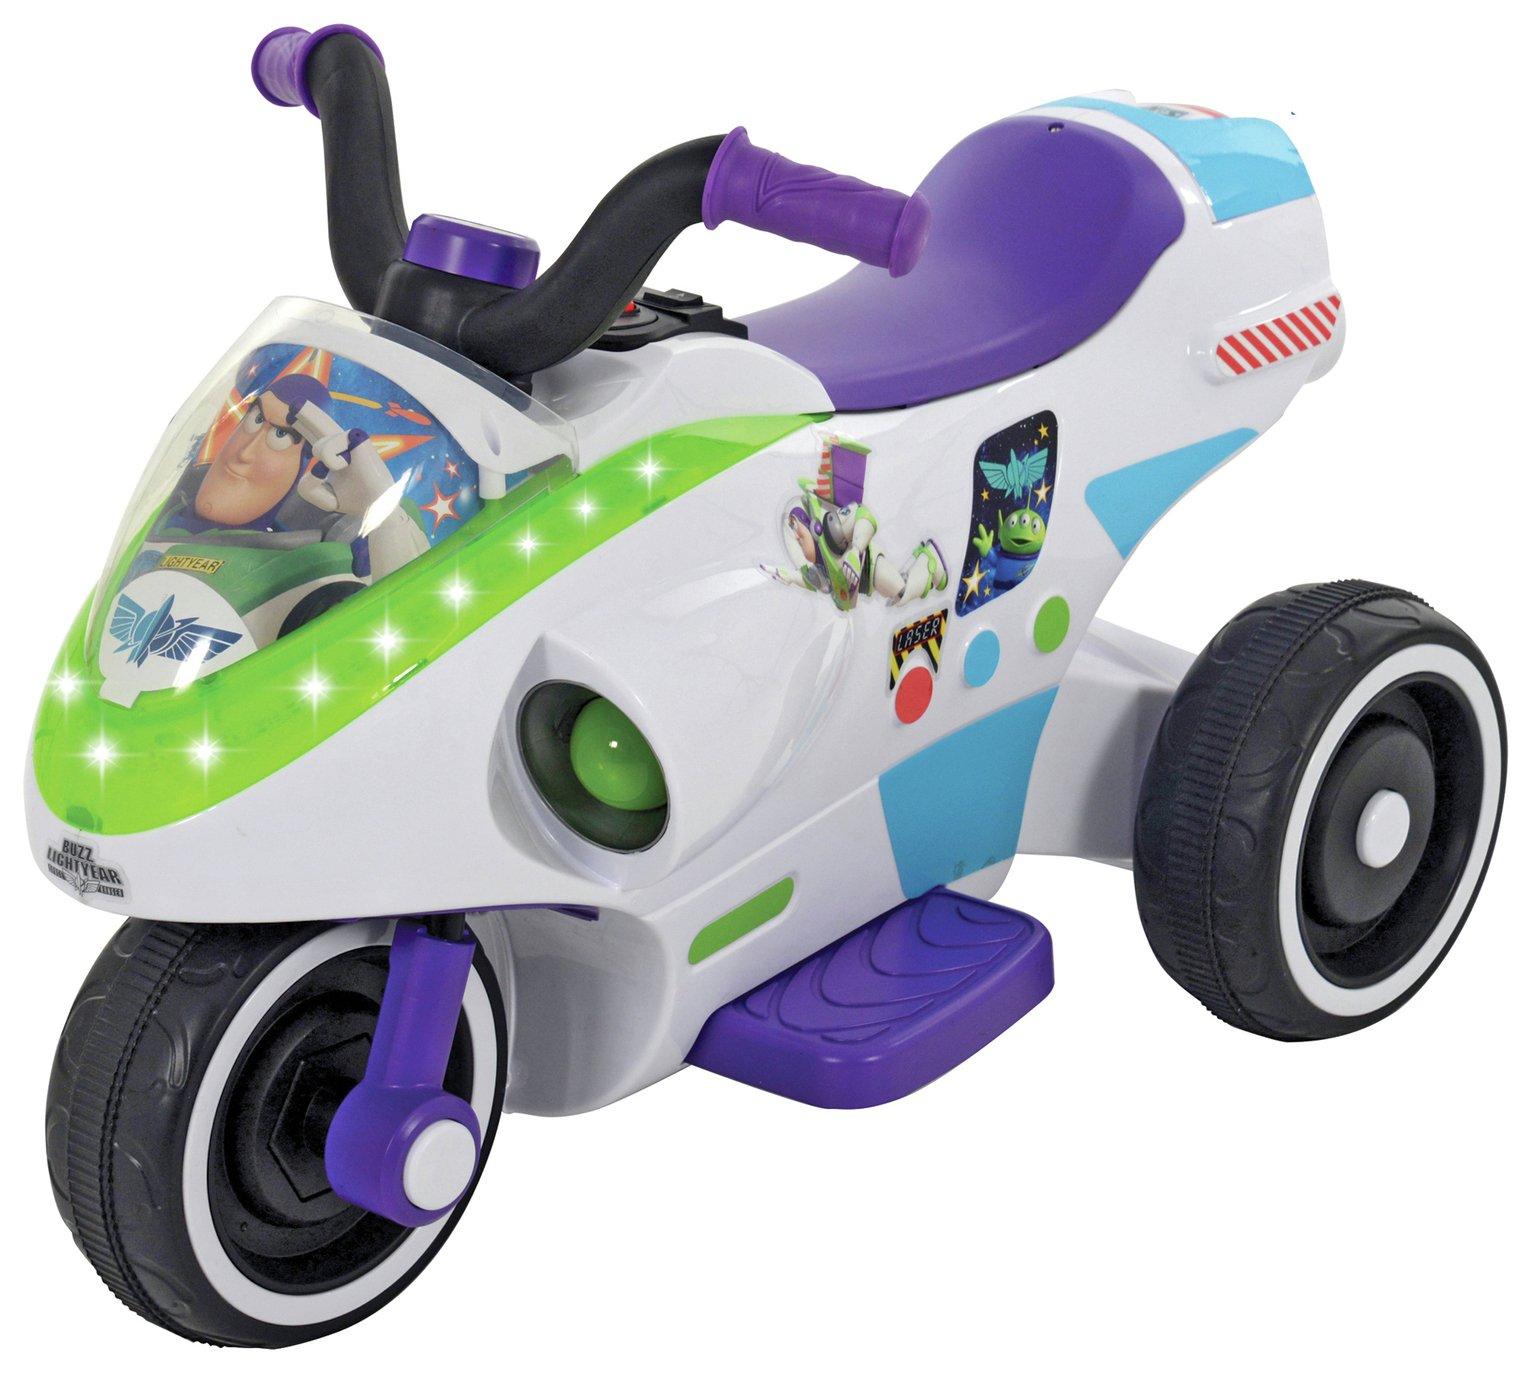 Disney Toy Story Buzz Lightyear 6V Space Cruiser Ride On